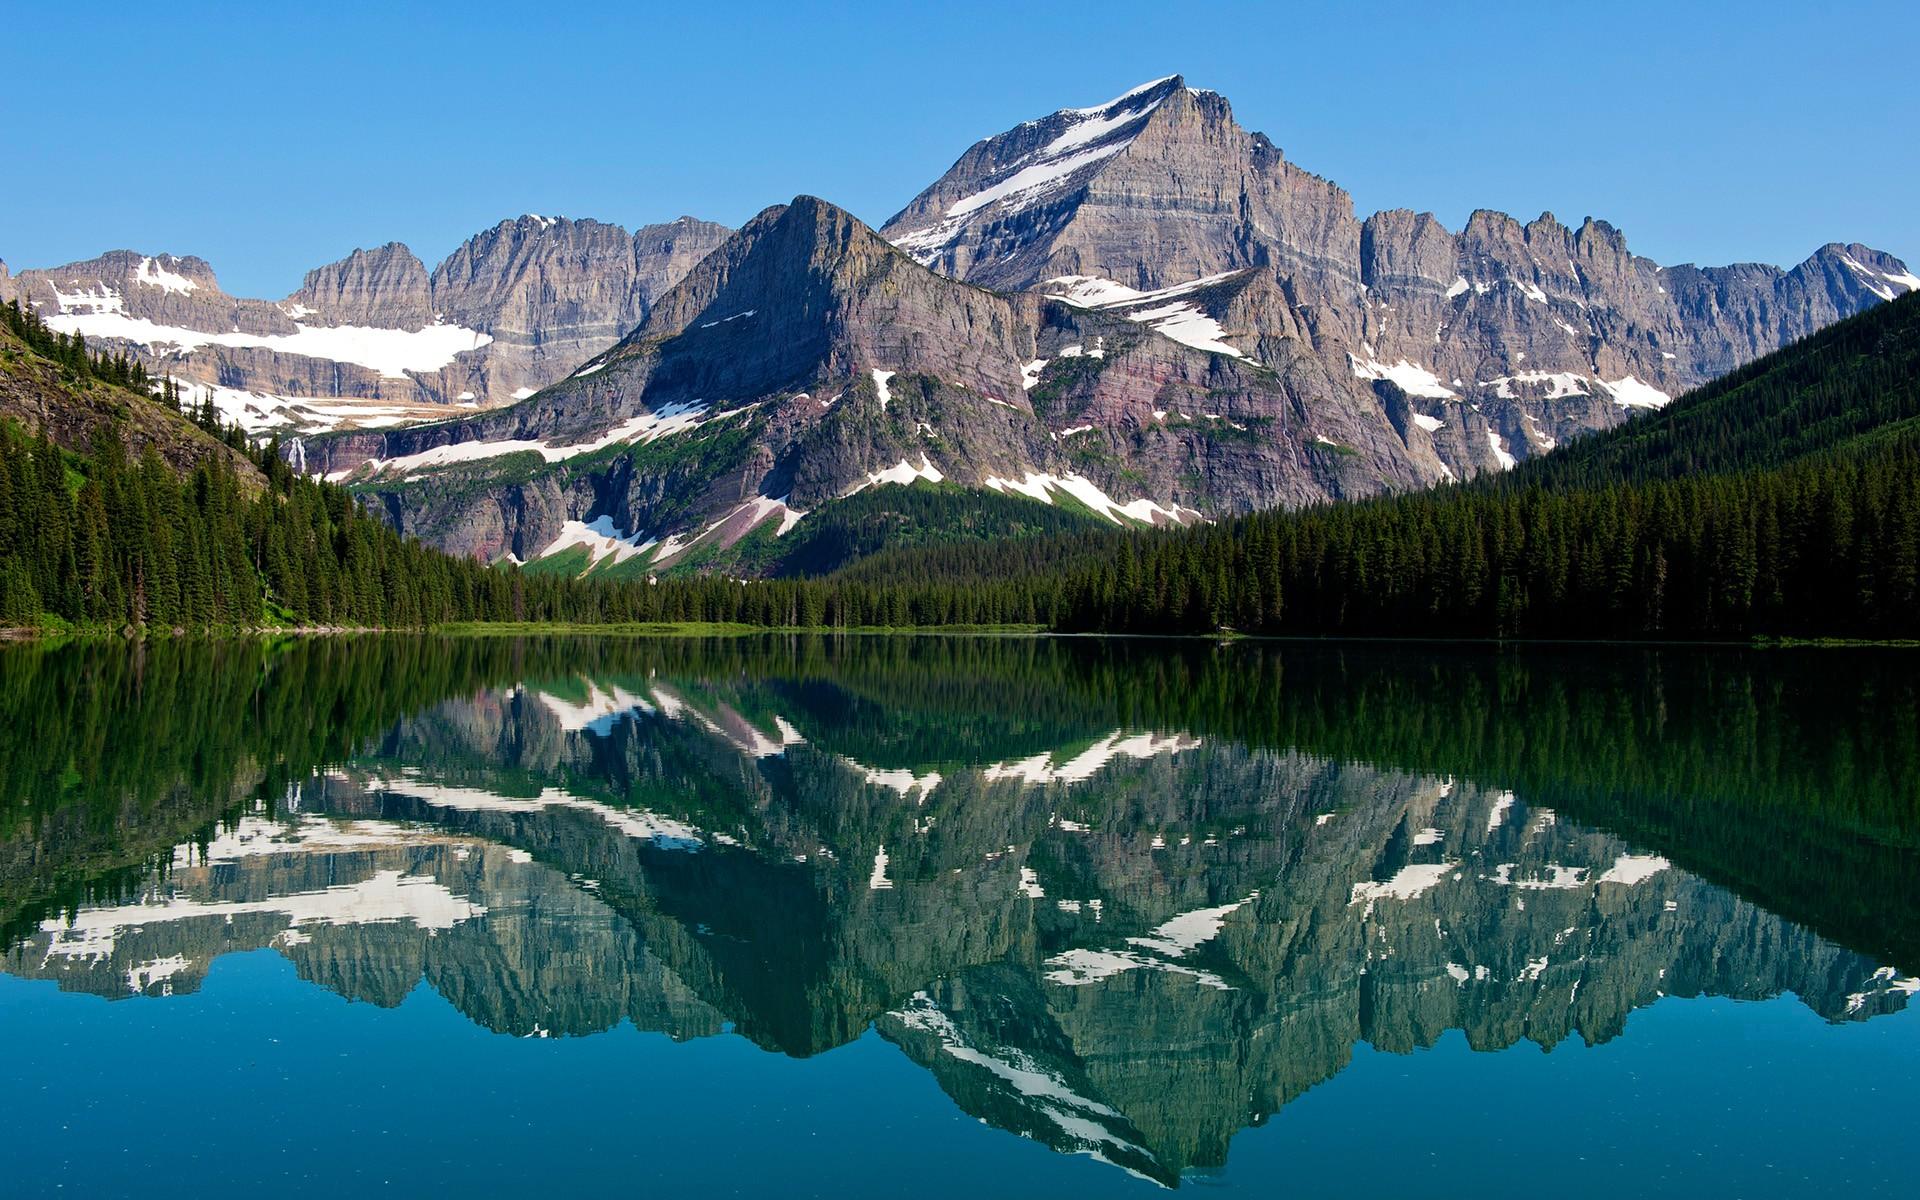 Lake Mountain Reflection Minimalism Wallpapers Hd: Mountain Lake Reflections, HD Nature, 4k Wallpapers